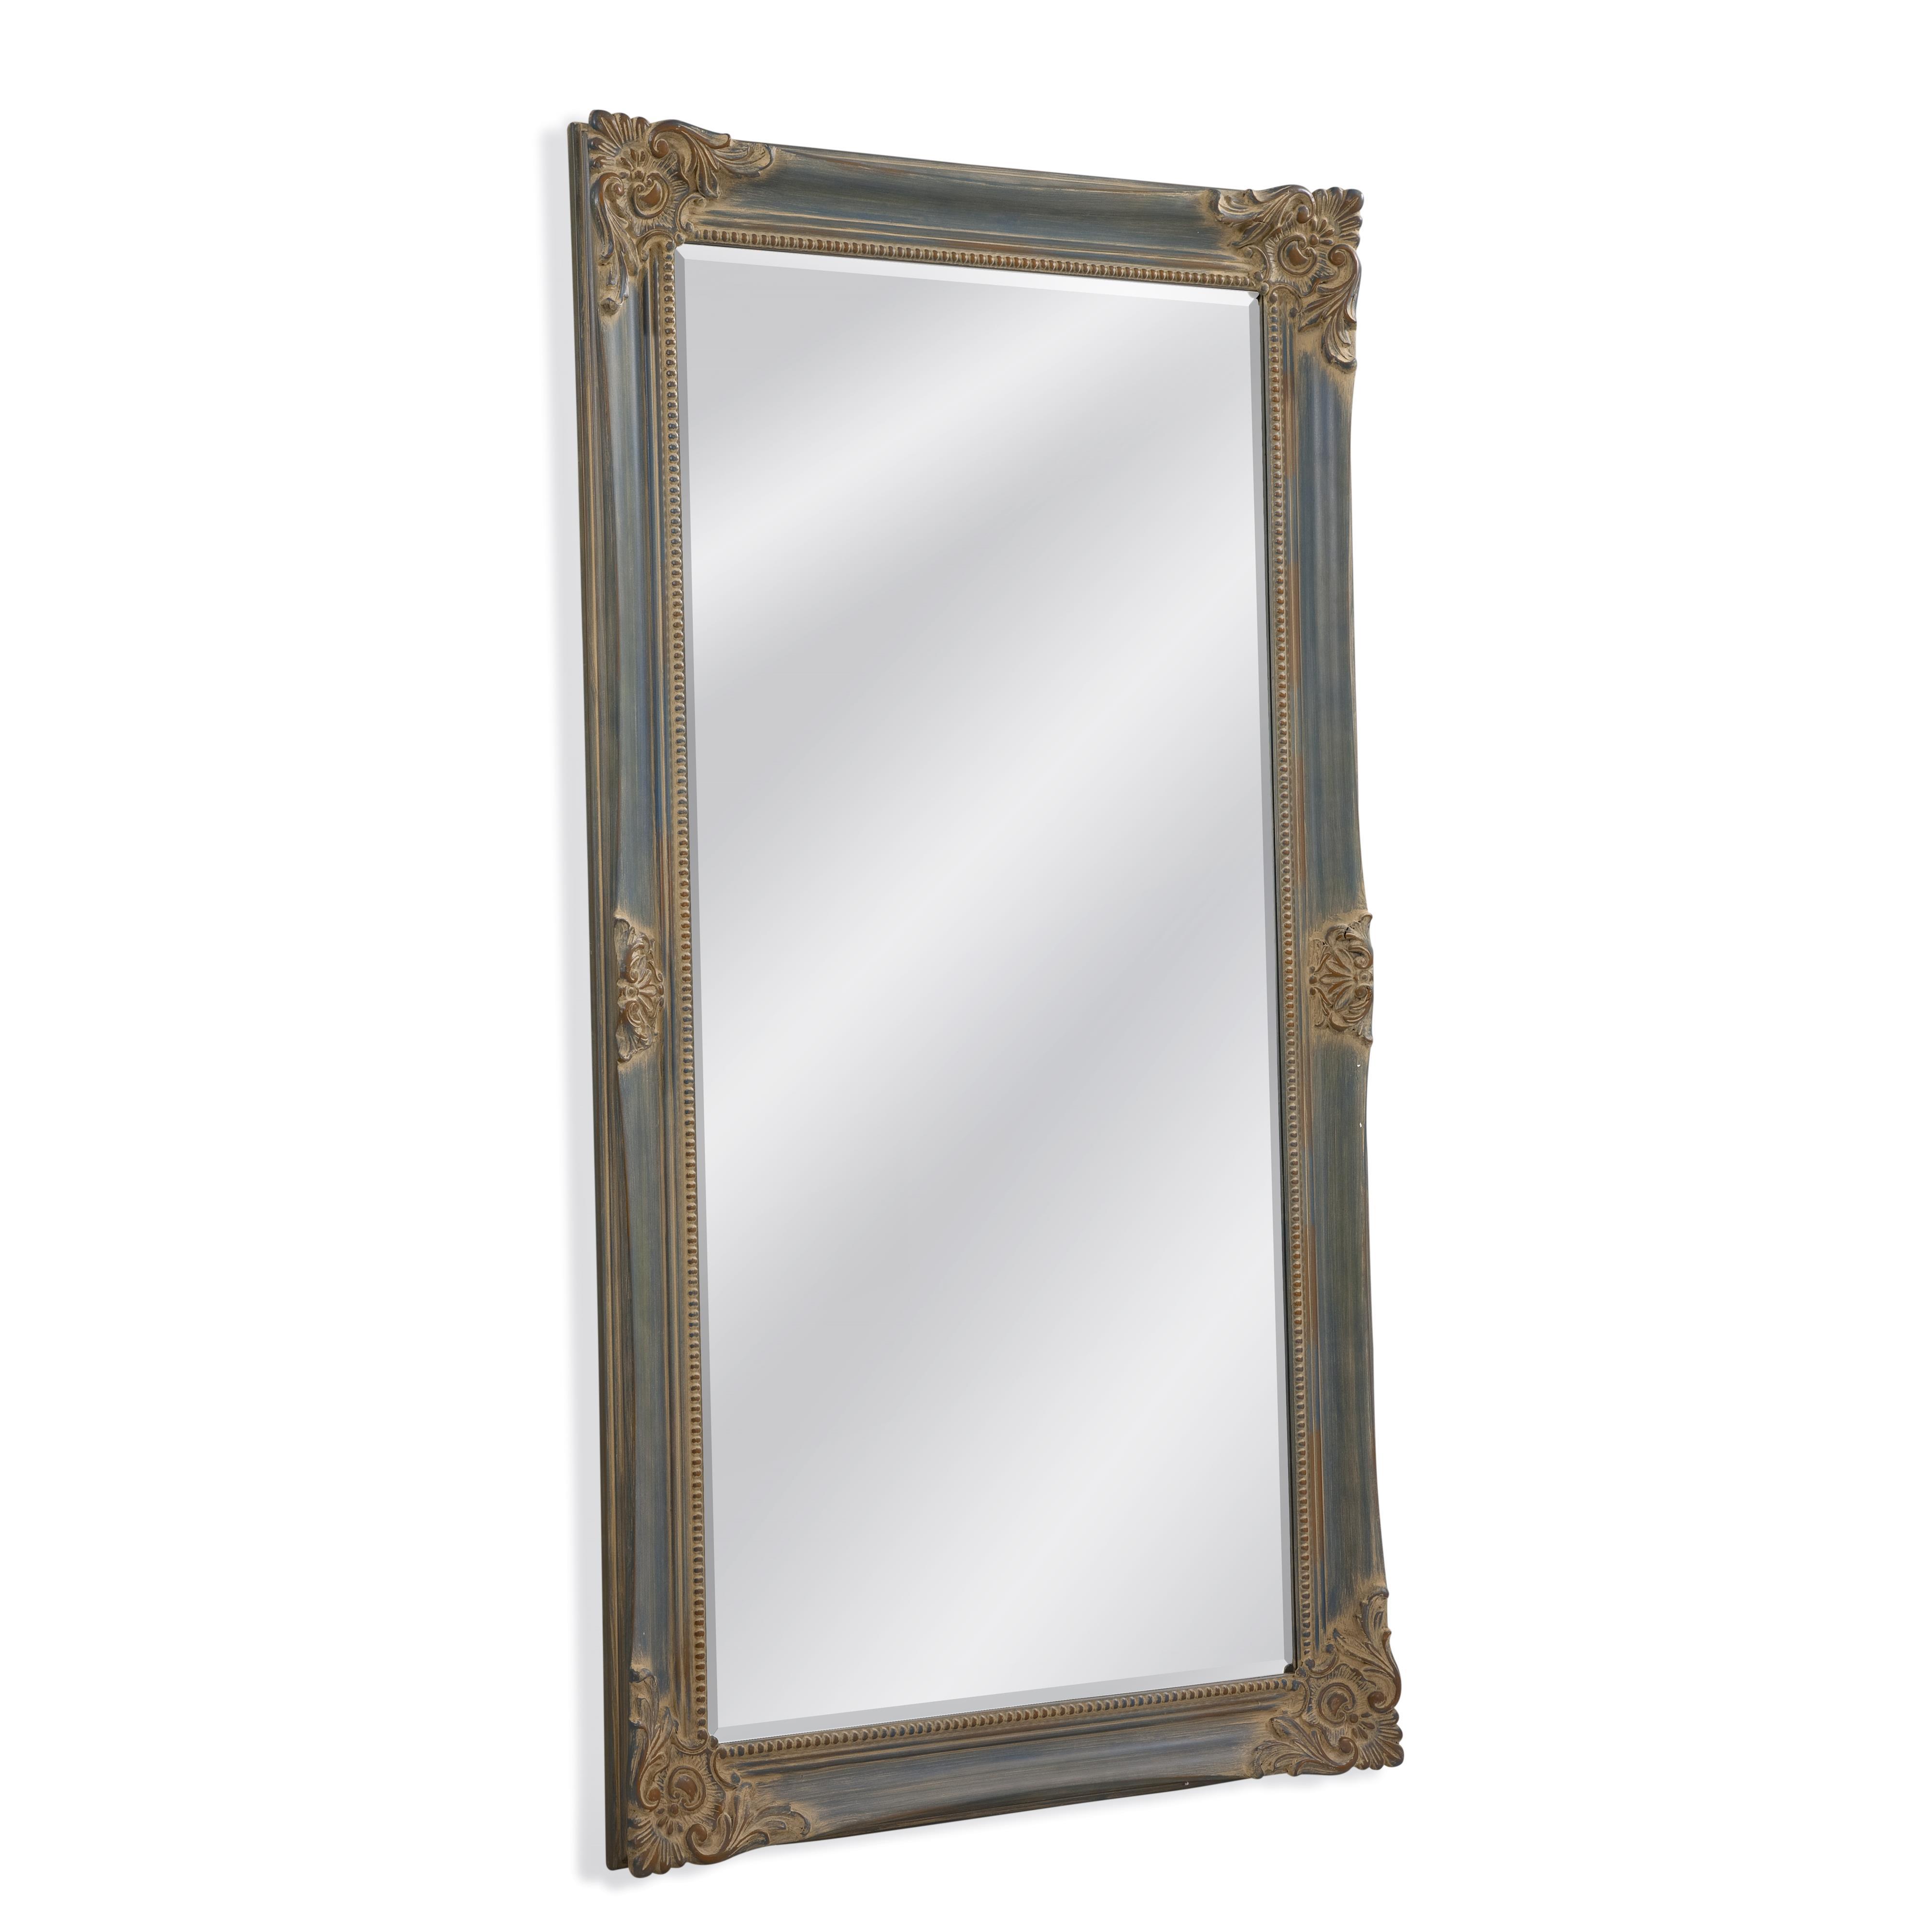 Belgian Luxe Belton Leaner Mirror by Bassett Mirror at Alison Craig Home Furnishings